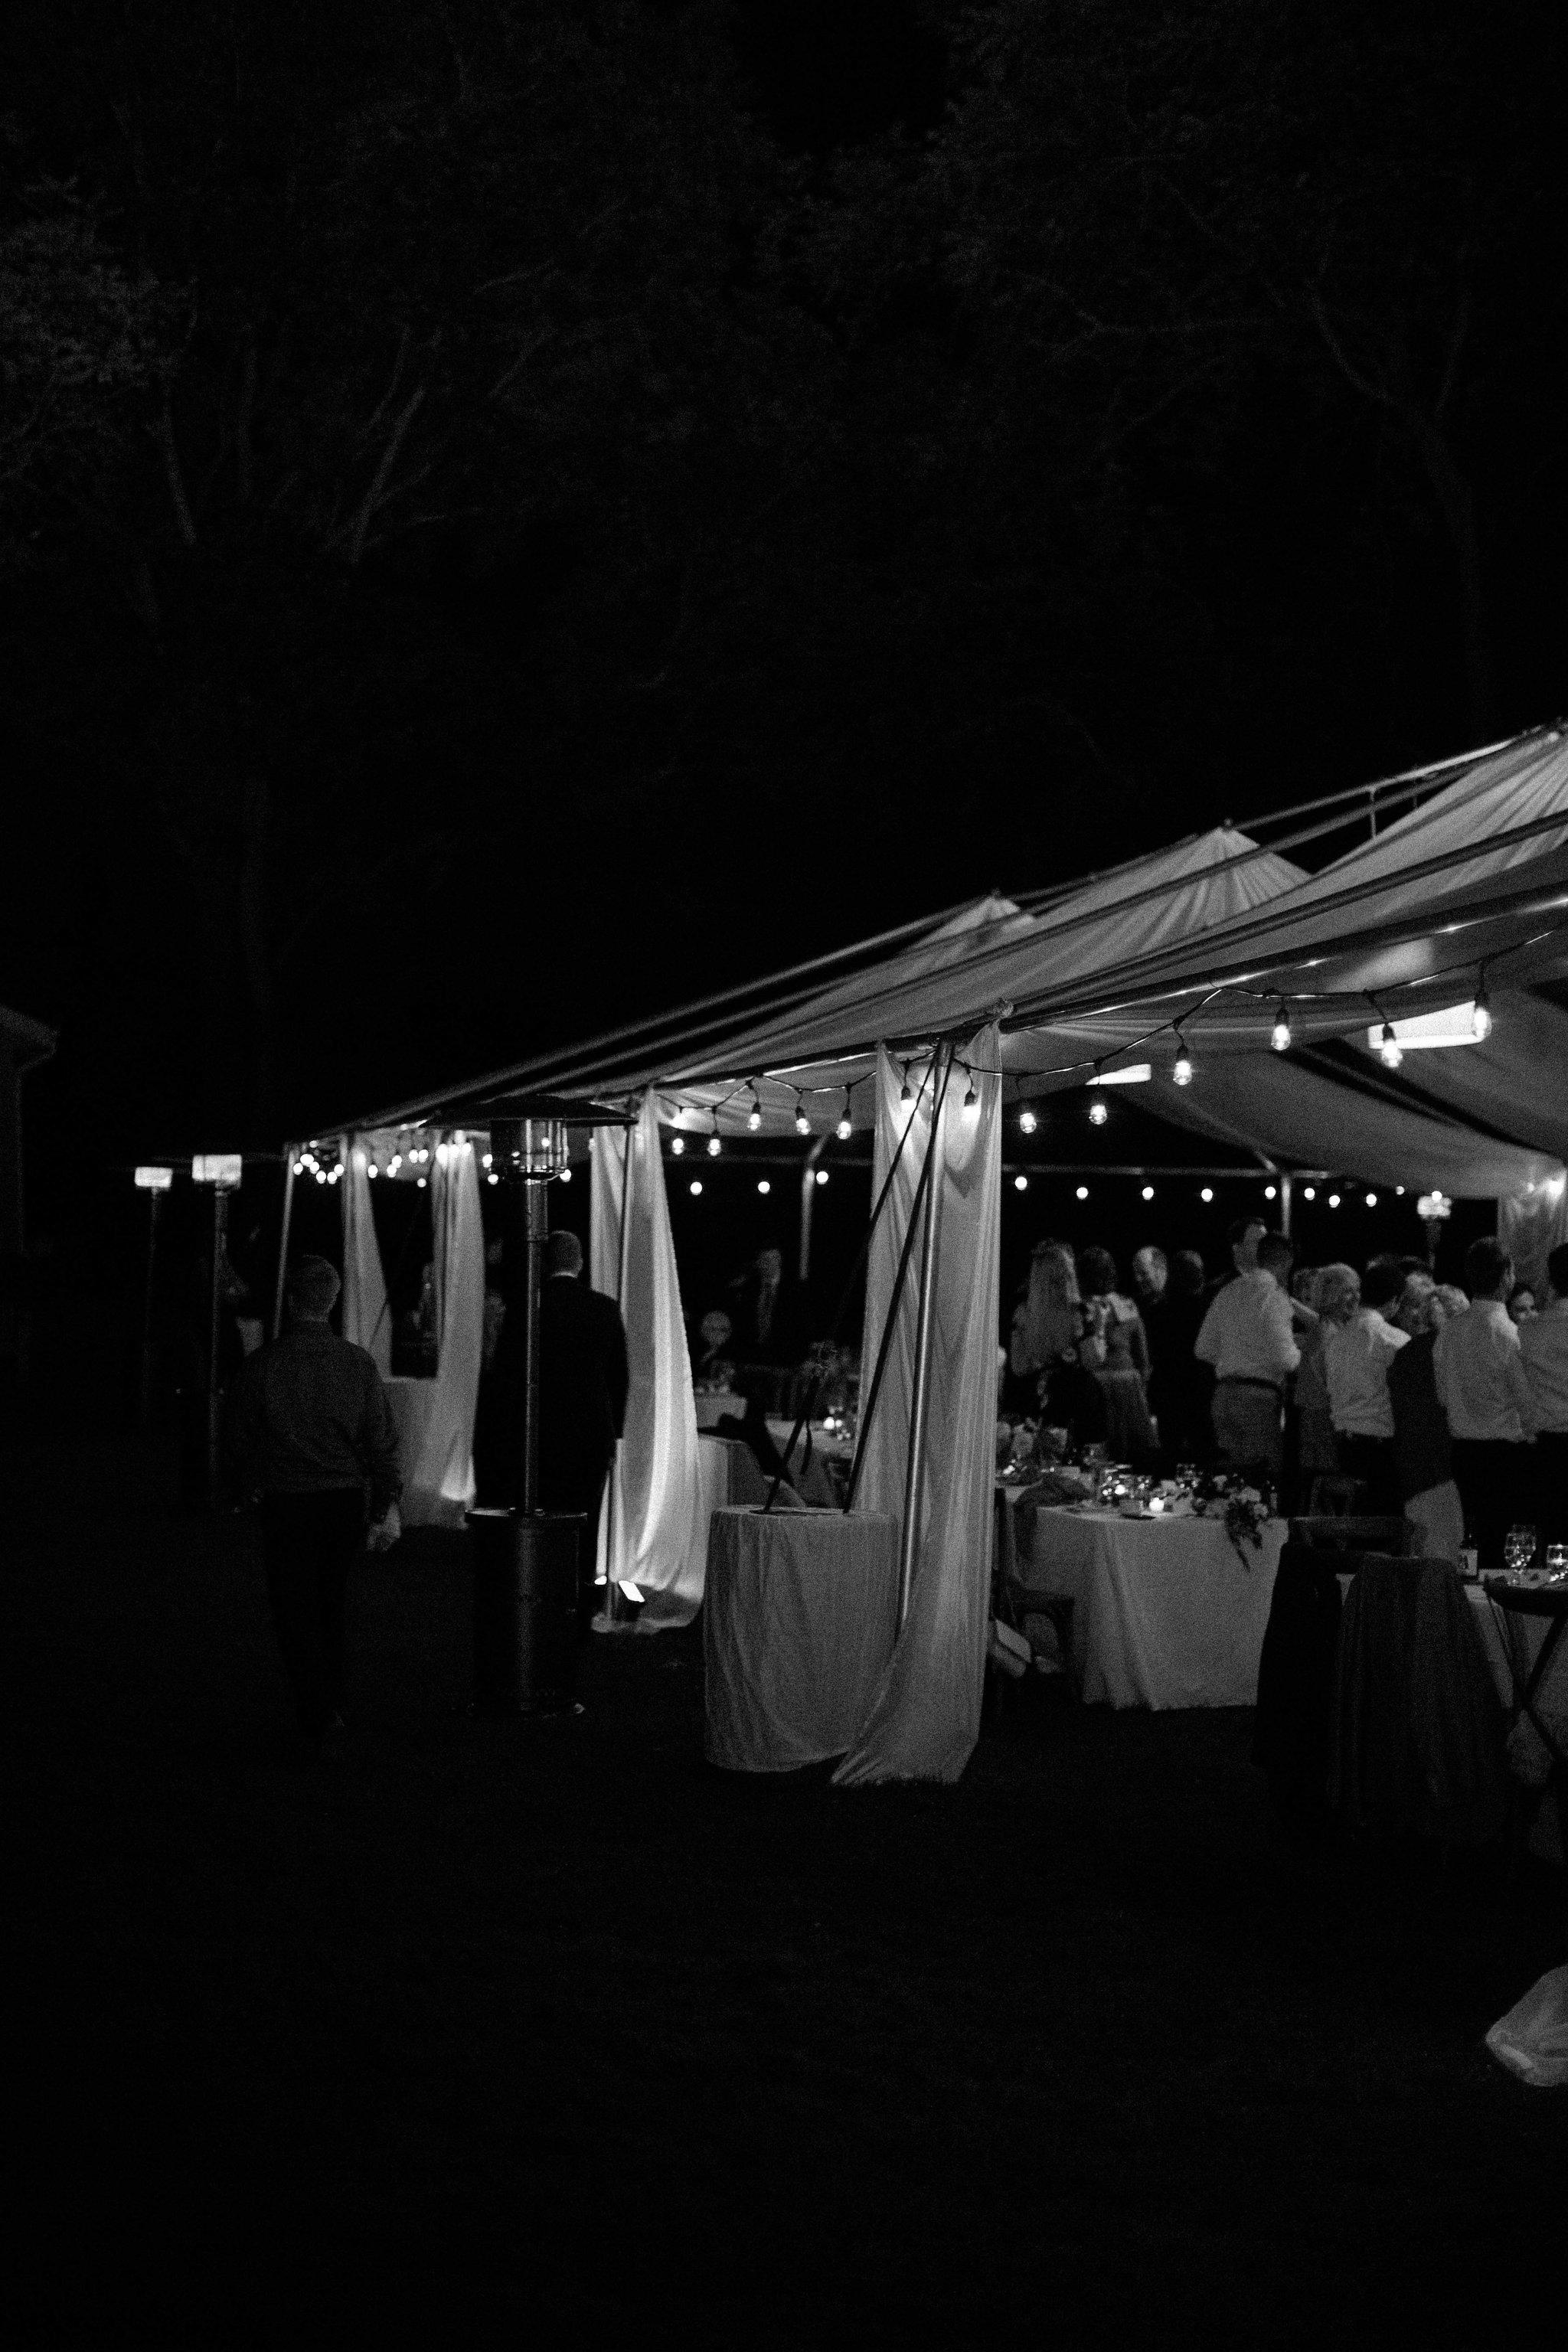 Wedding tent at night at Fernwood Botanical Garden and Nature Preserve